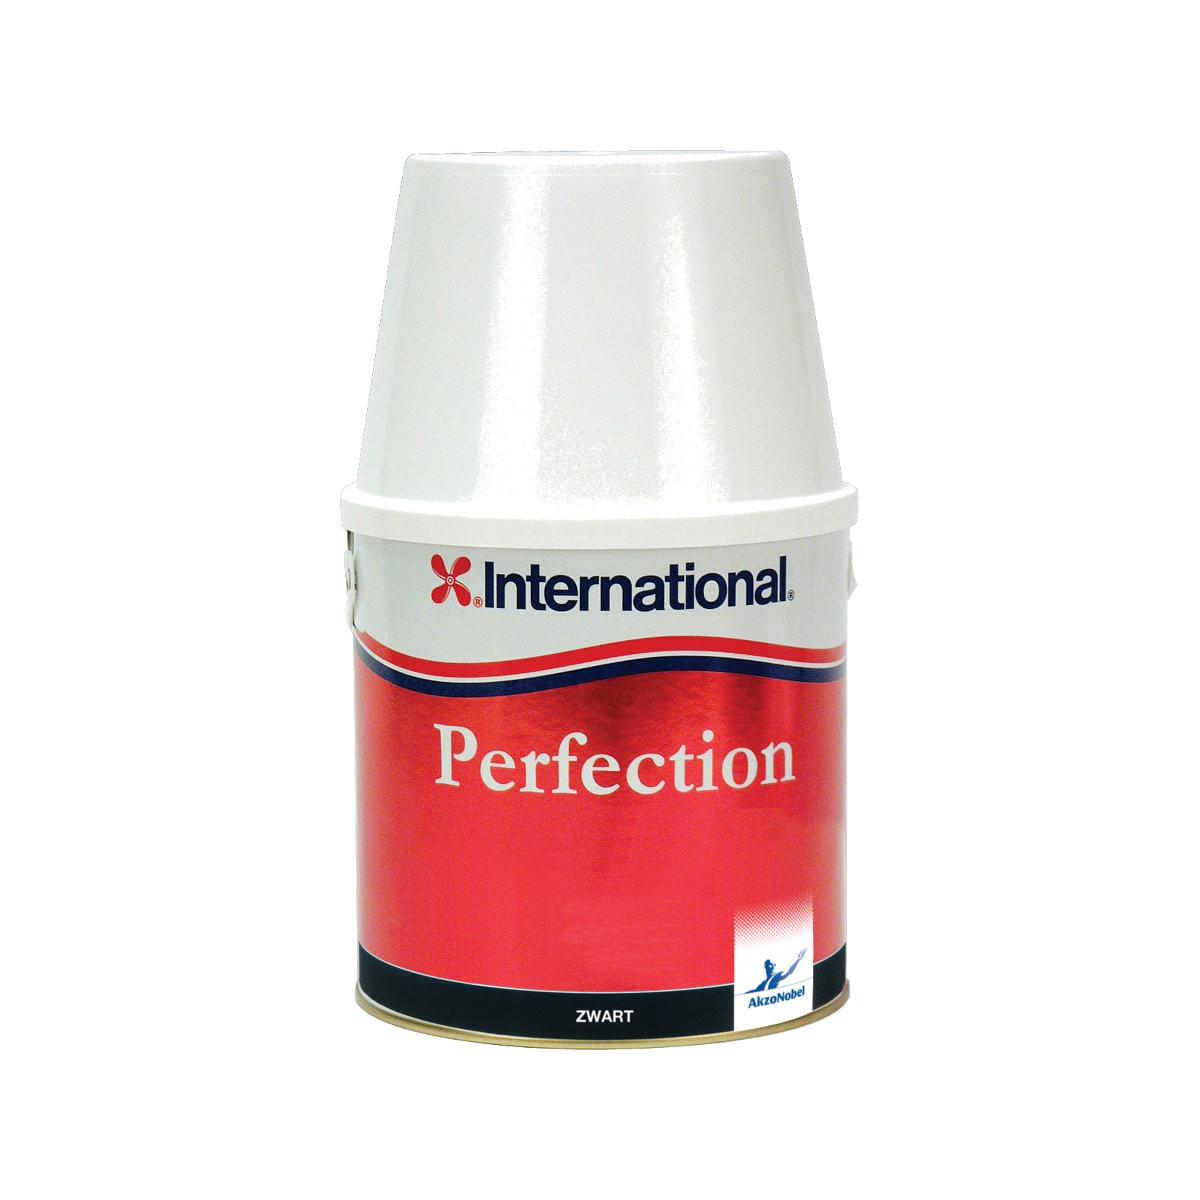 International Perfection aflak - blauw 991, 2250ml